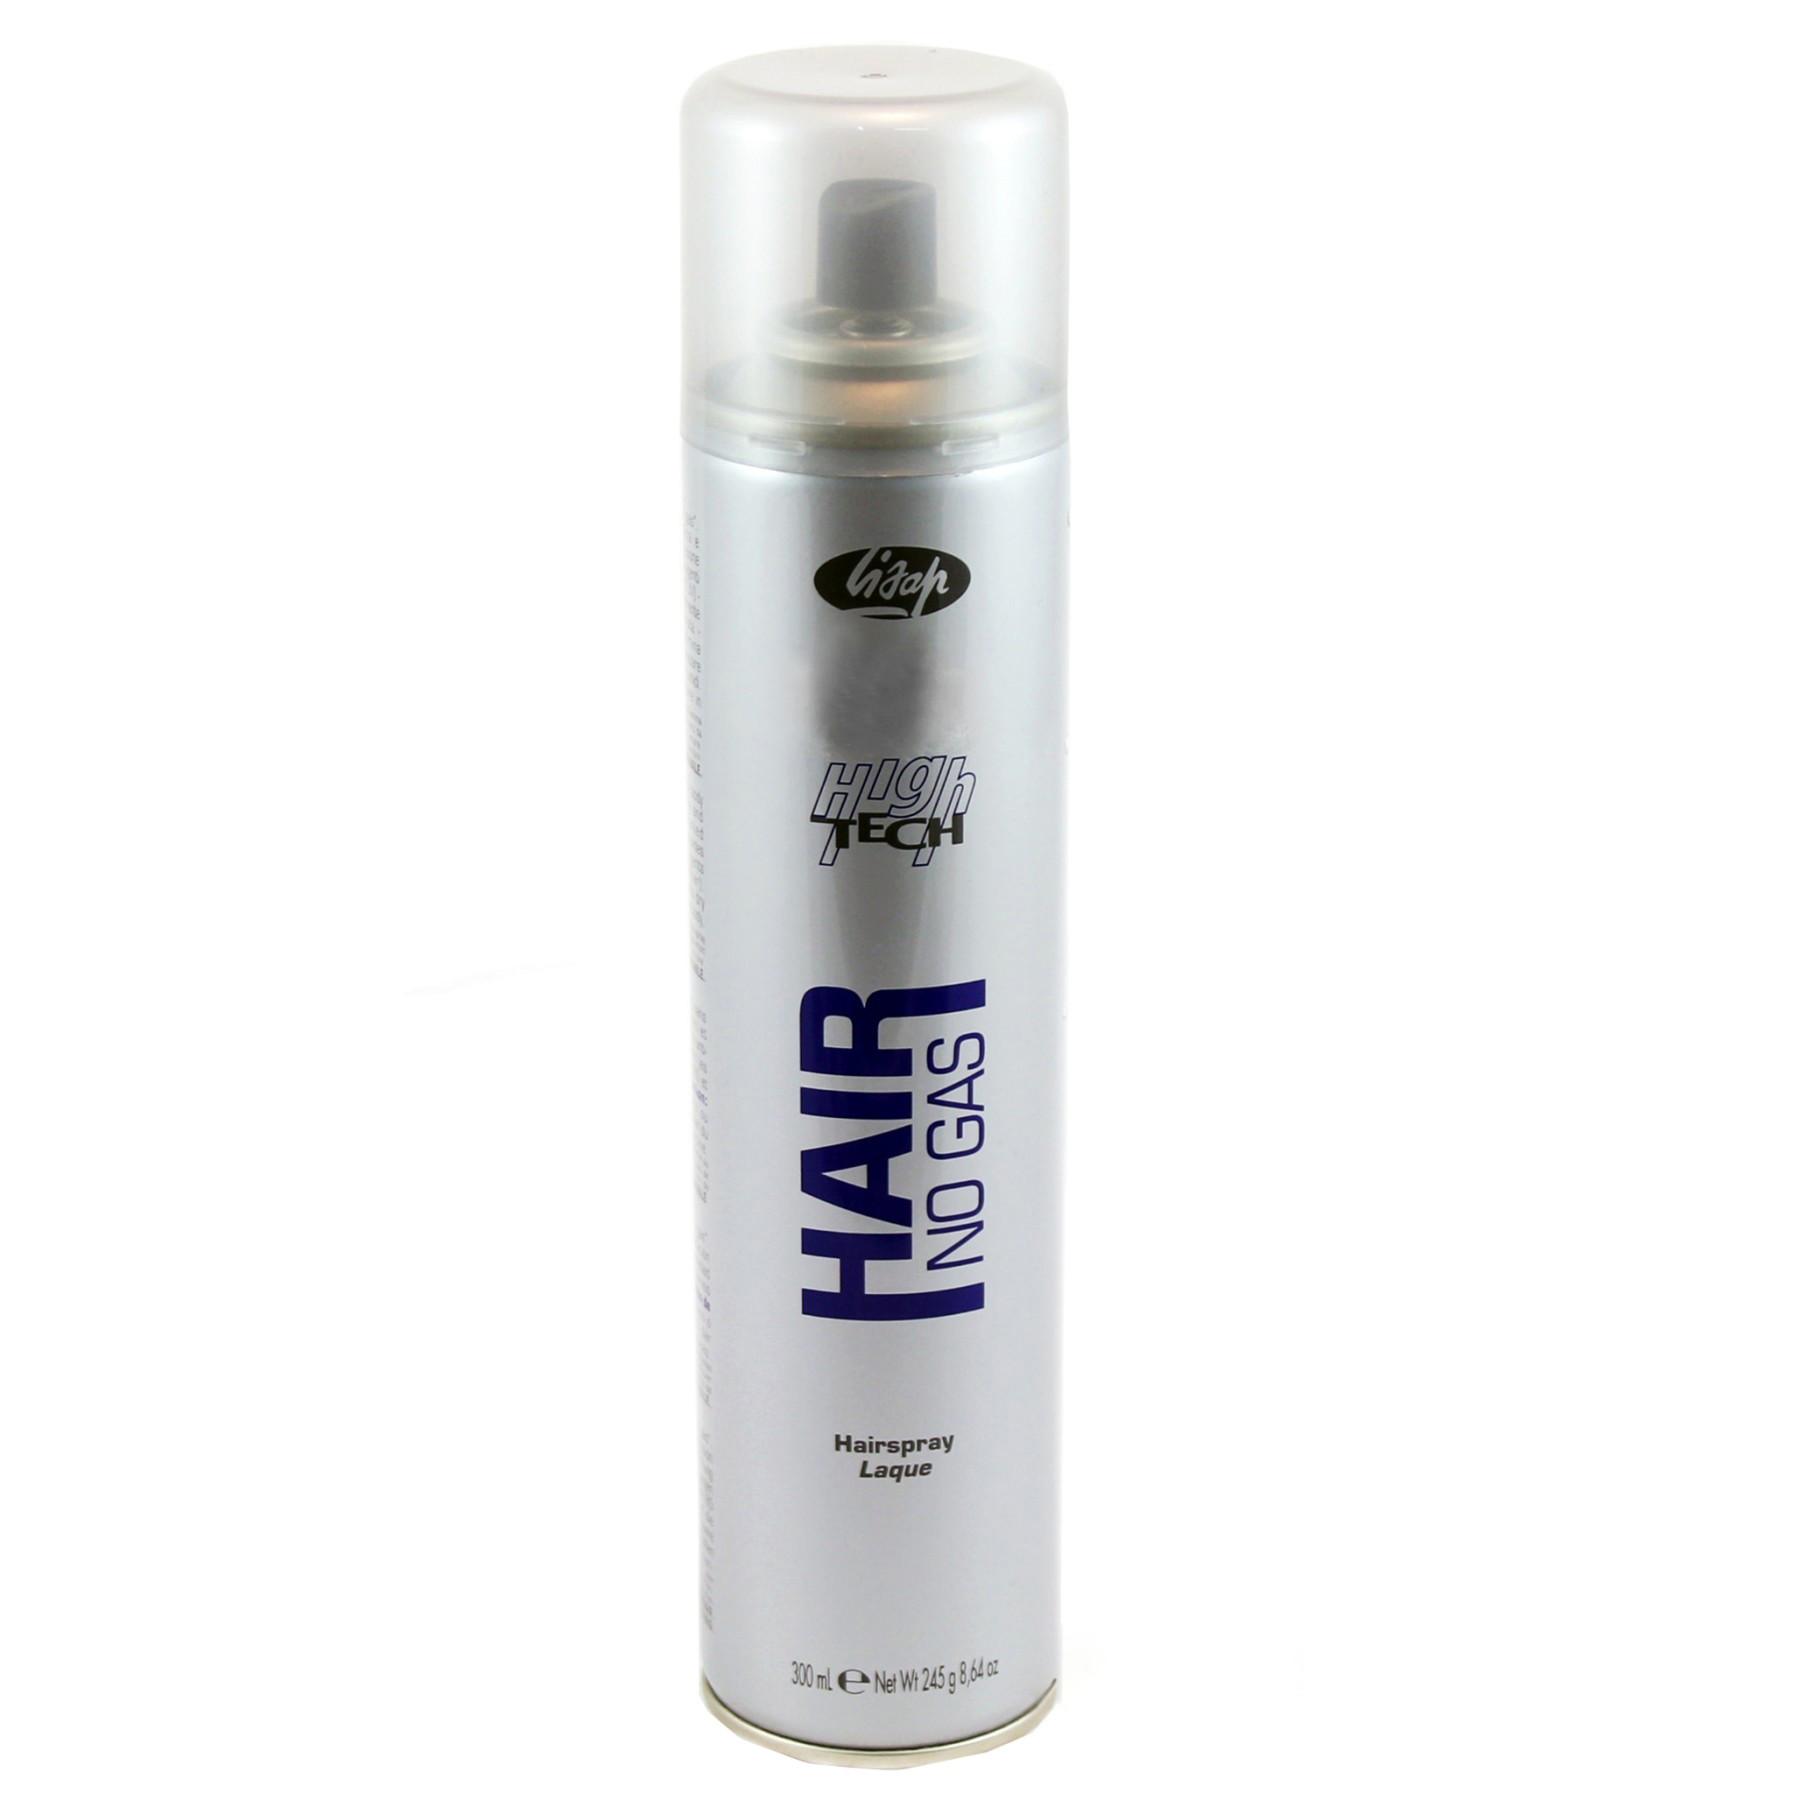 Лак для волос без газа Lisap High Tech Hair No Gas Hairspray нормальной фиксации 300 мл